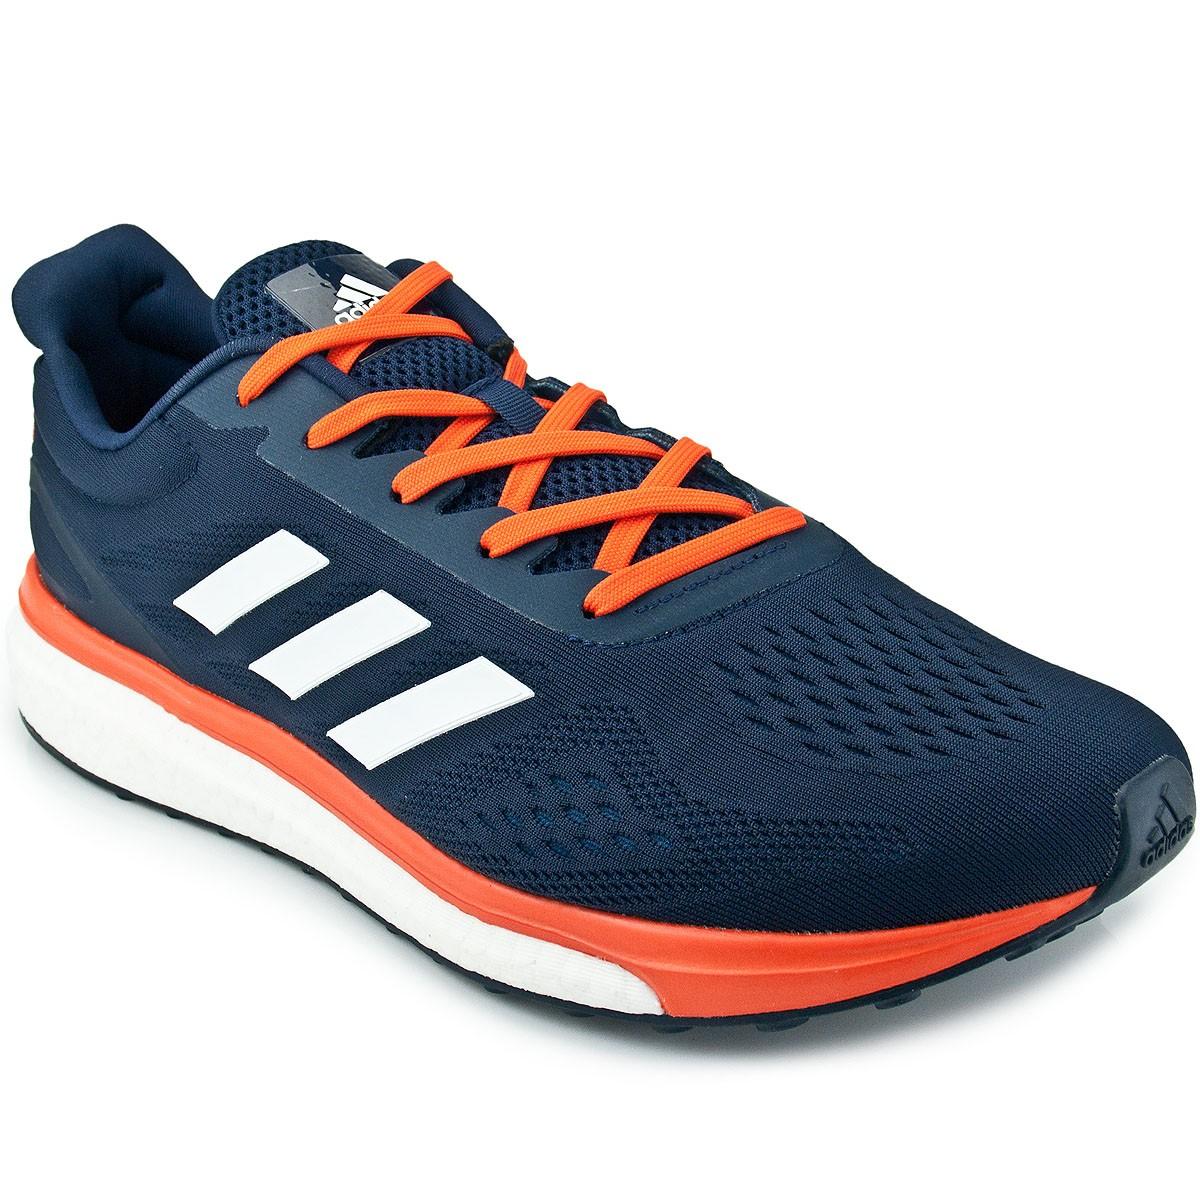 Tênis Adidas Response Boost LT  ed2773a47ff2f